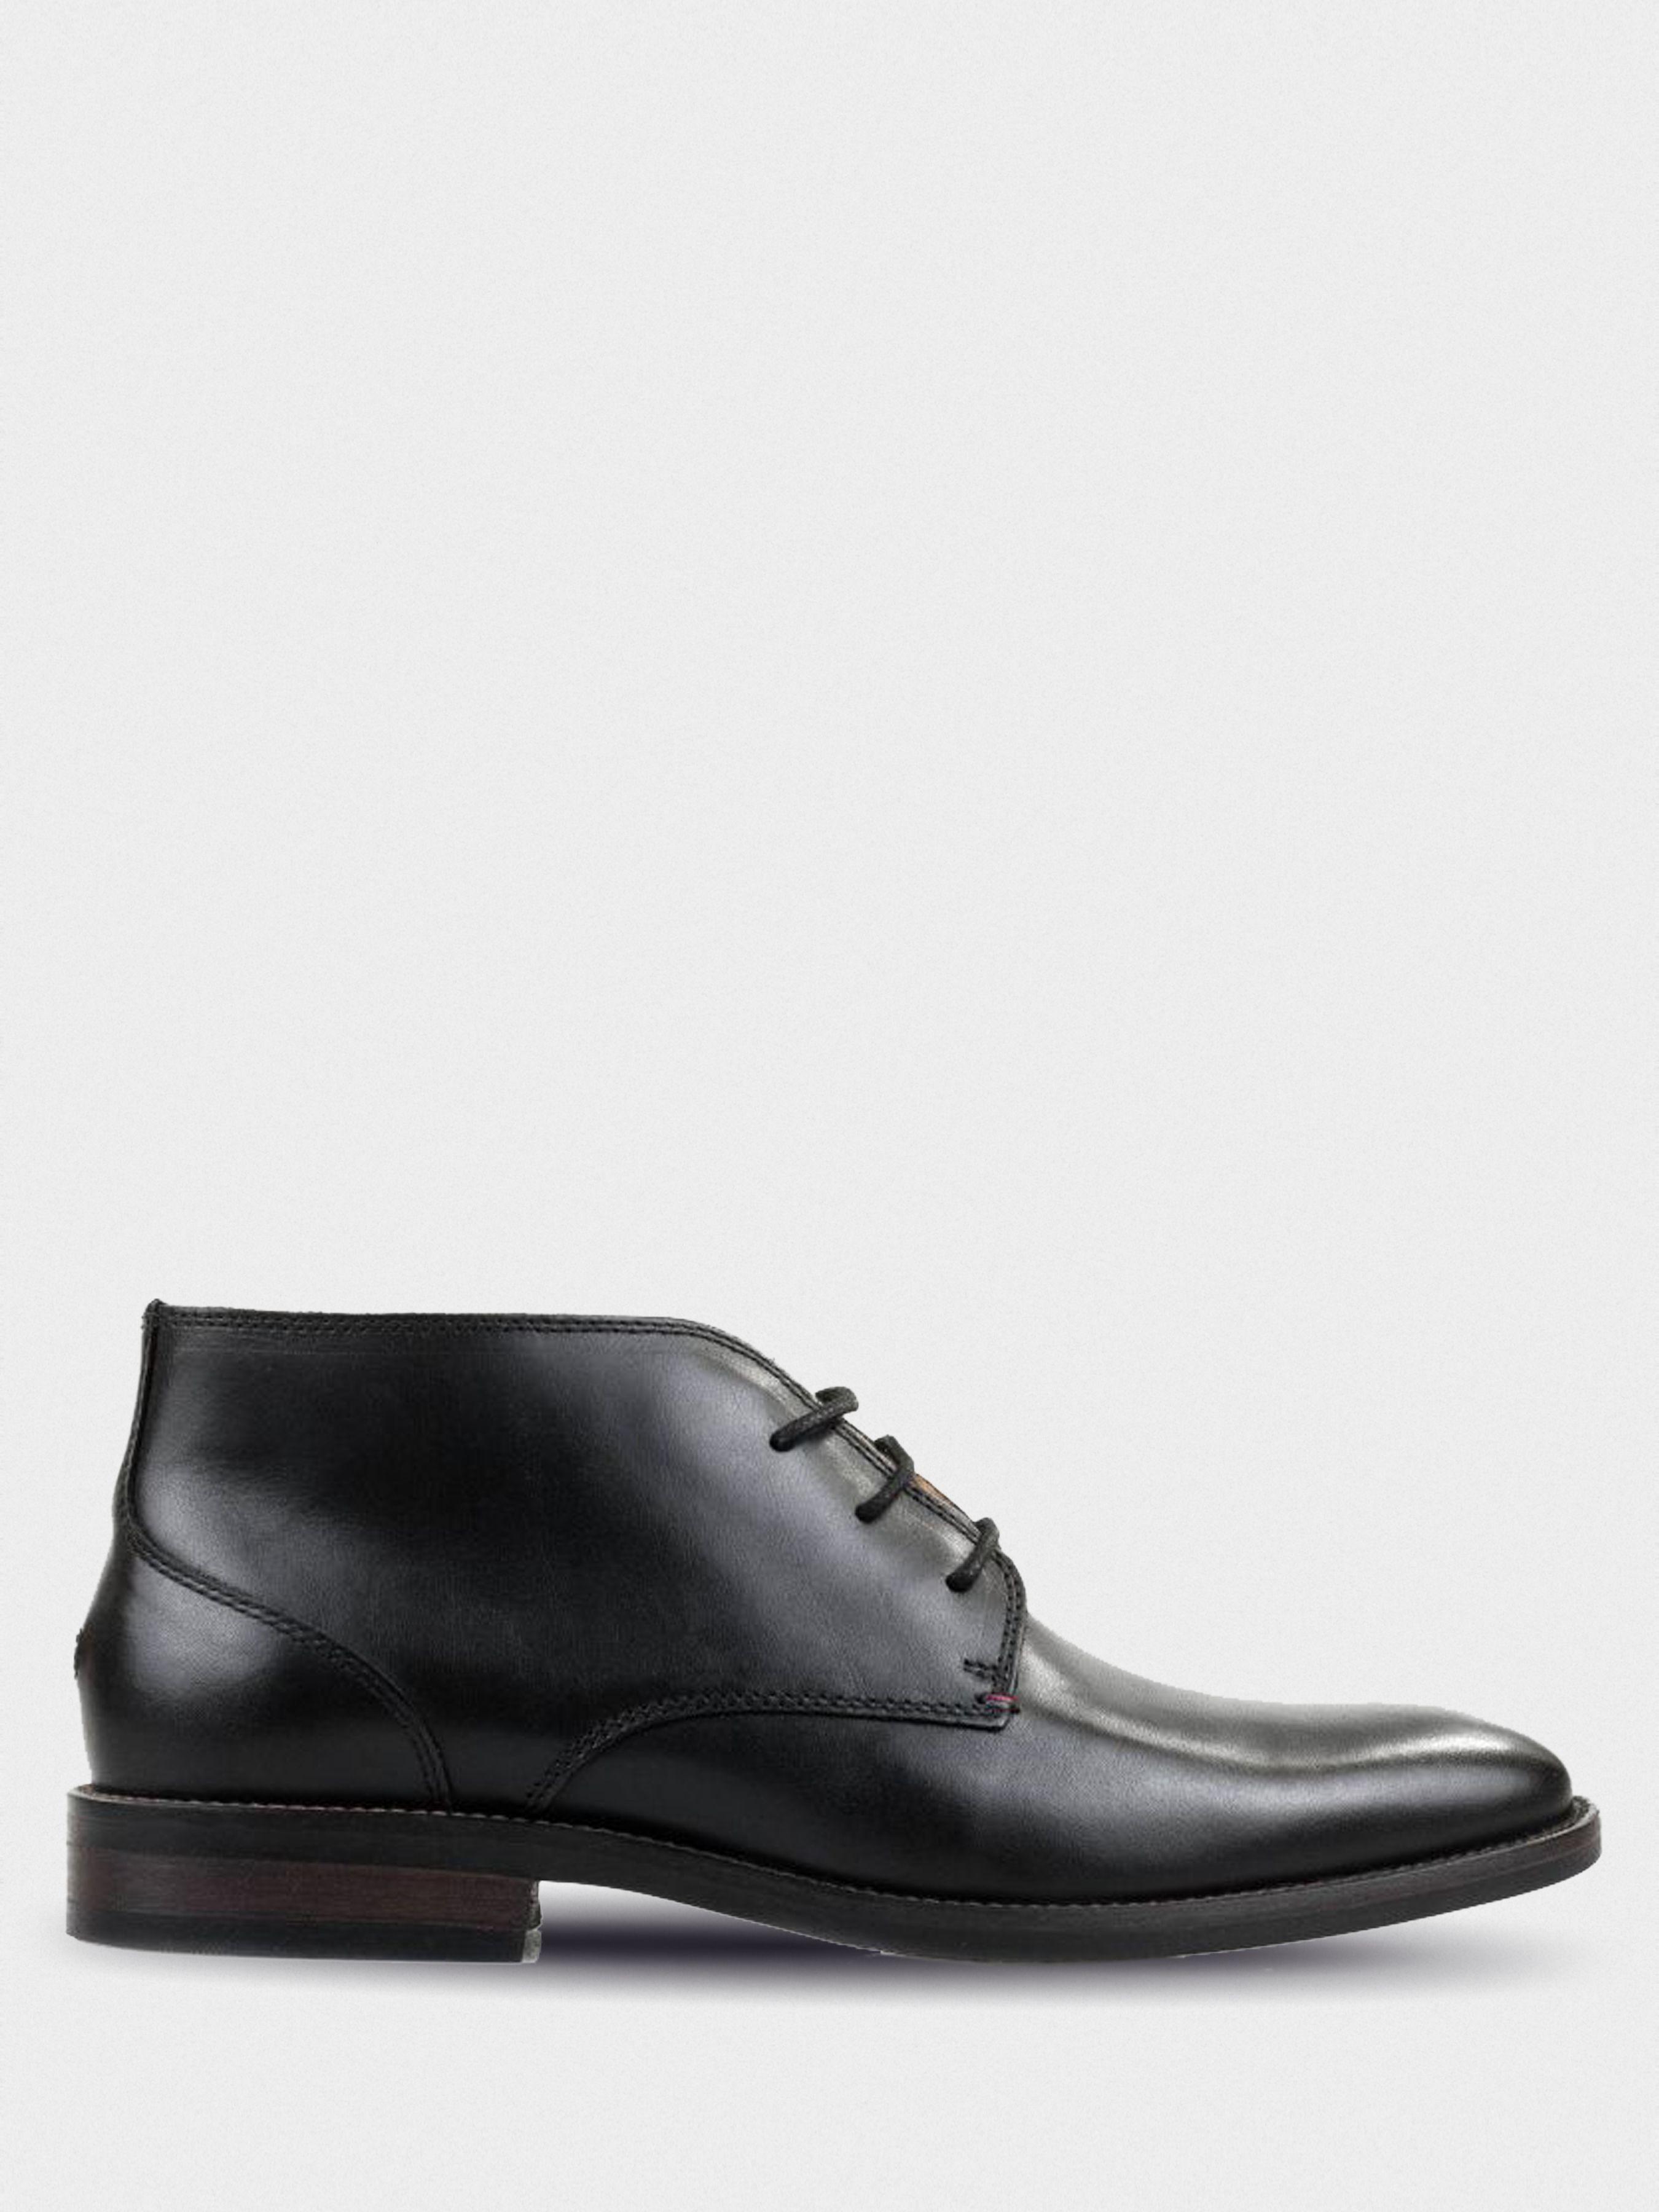 Ботинки для мужчин Tommy Hilfiger TE702 брендовая обувь, 2017